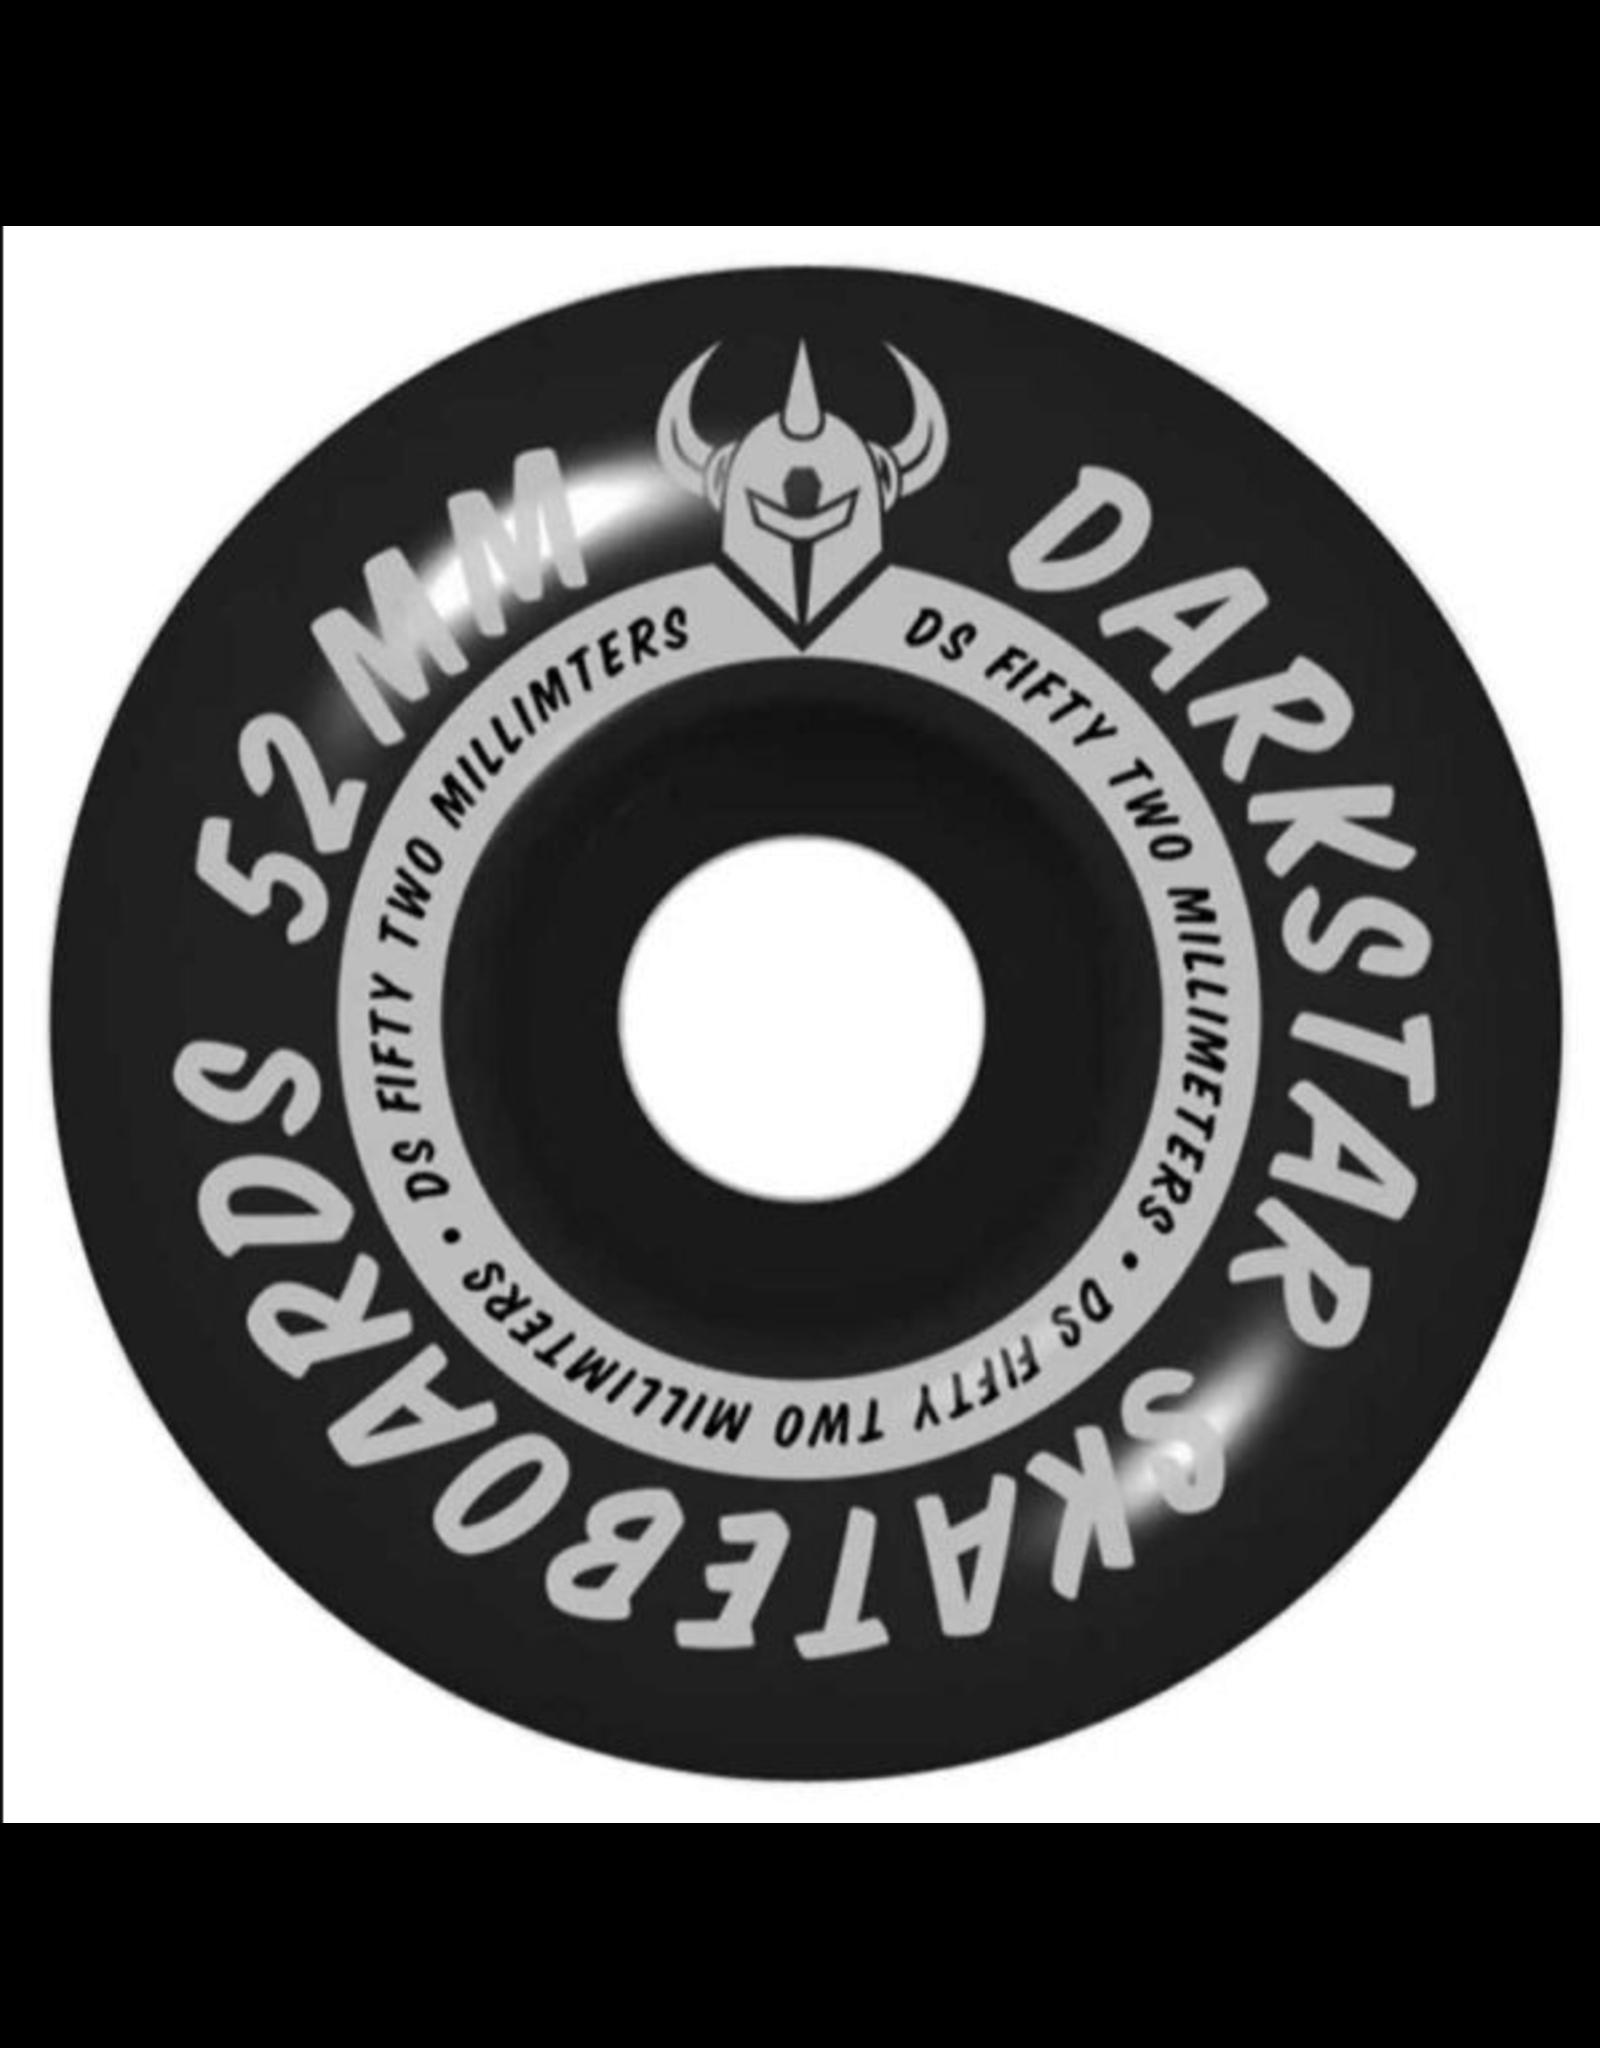 DARKSTAR DARKSTAR FELIX NEWS COMPLETE SKATEBOARD- 7.87 SILVER